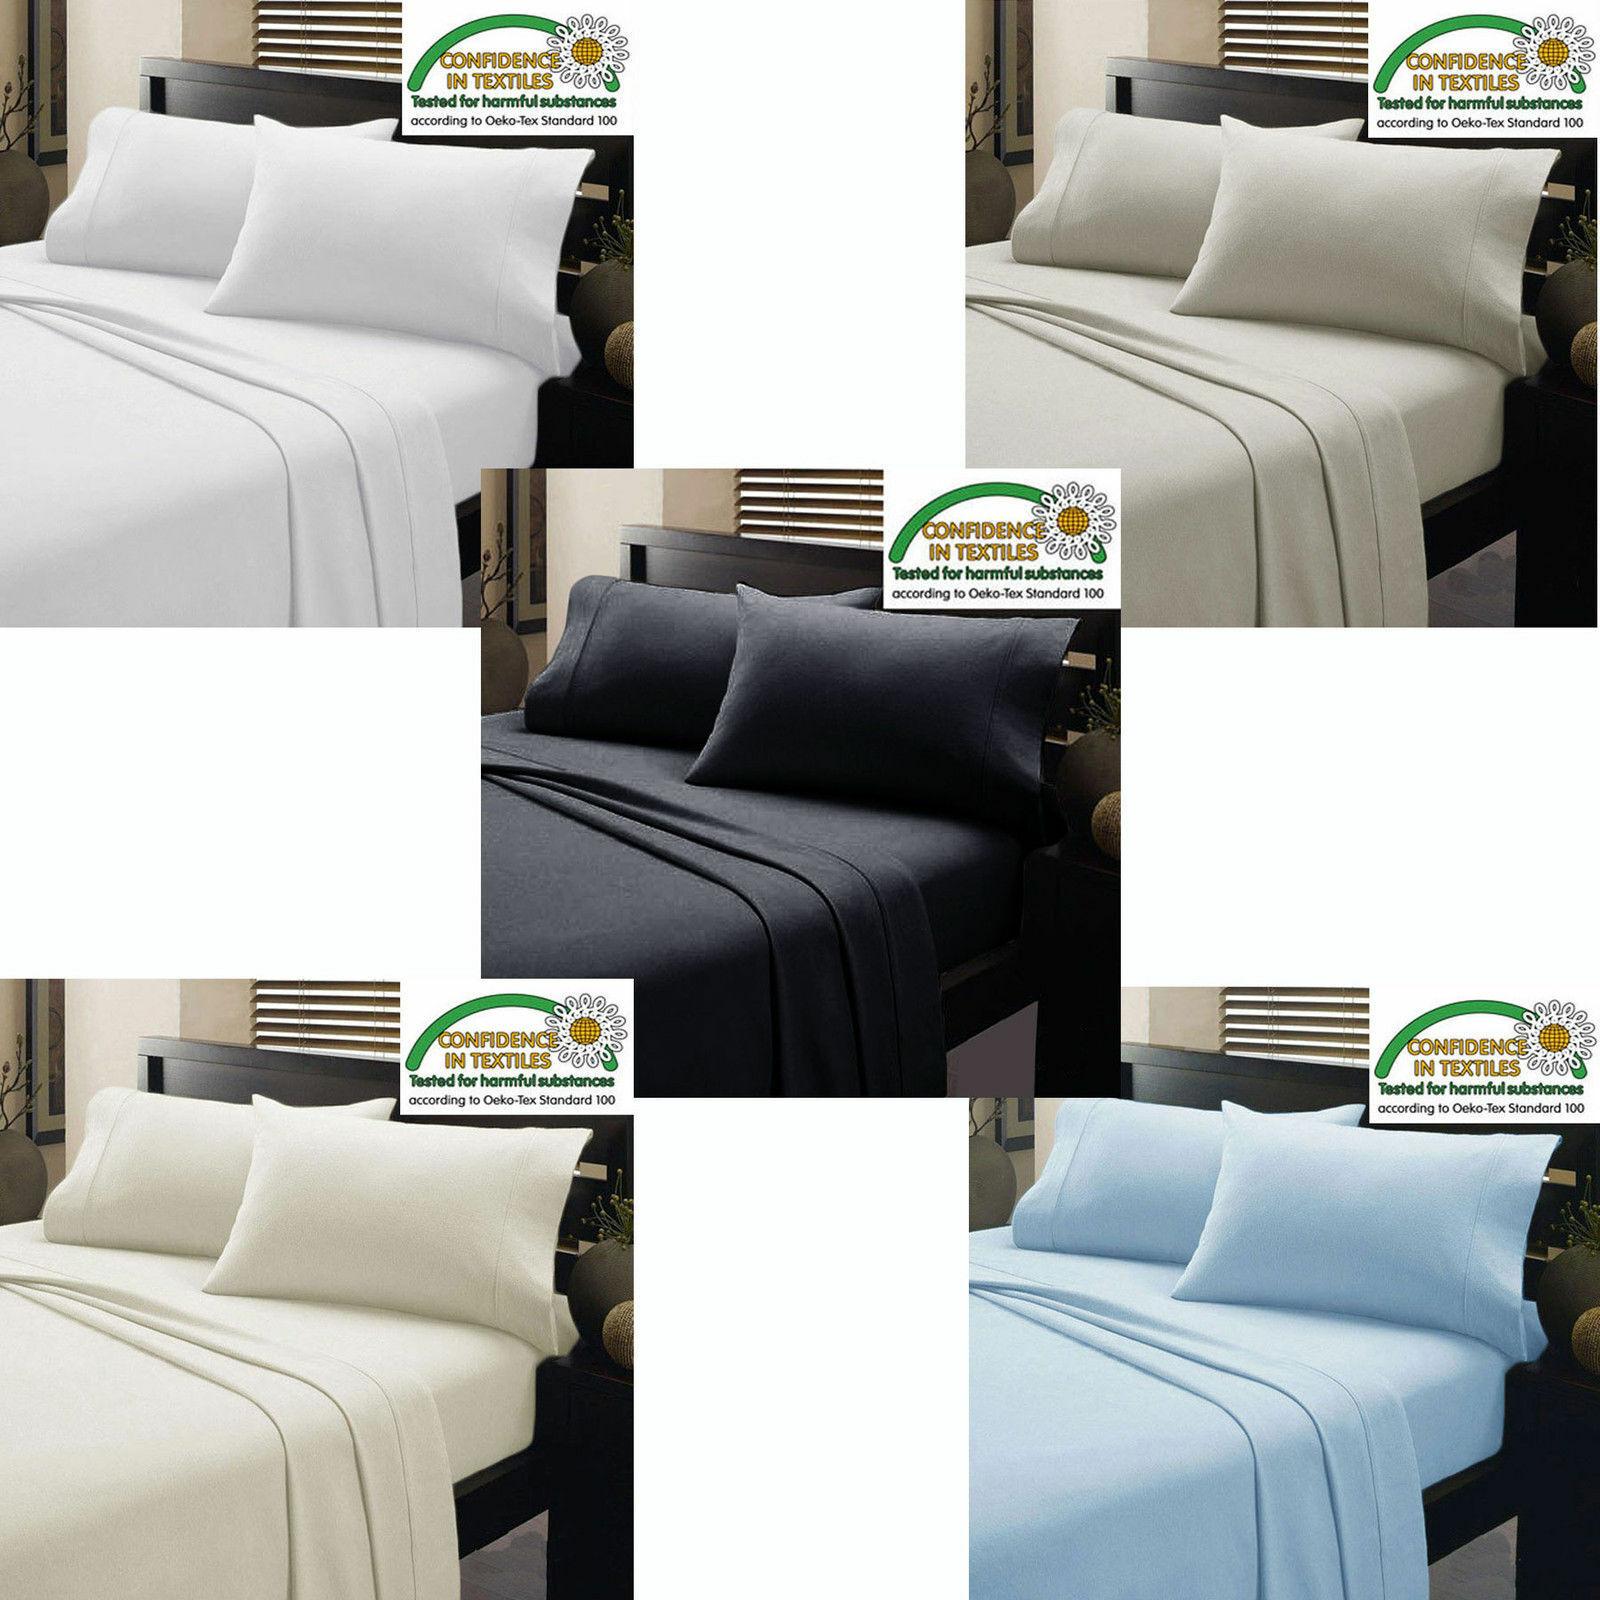 Luxury Sheet Set Full-XL Size Multi colors 800 Thread Count 100% Cotton 4 PCs